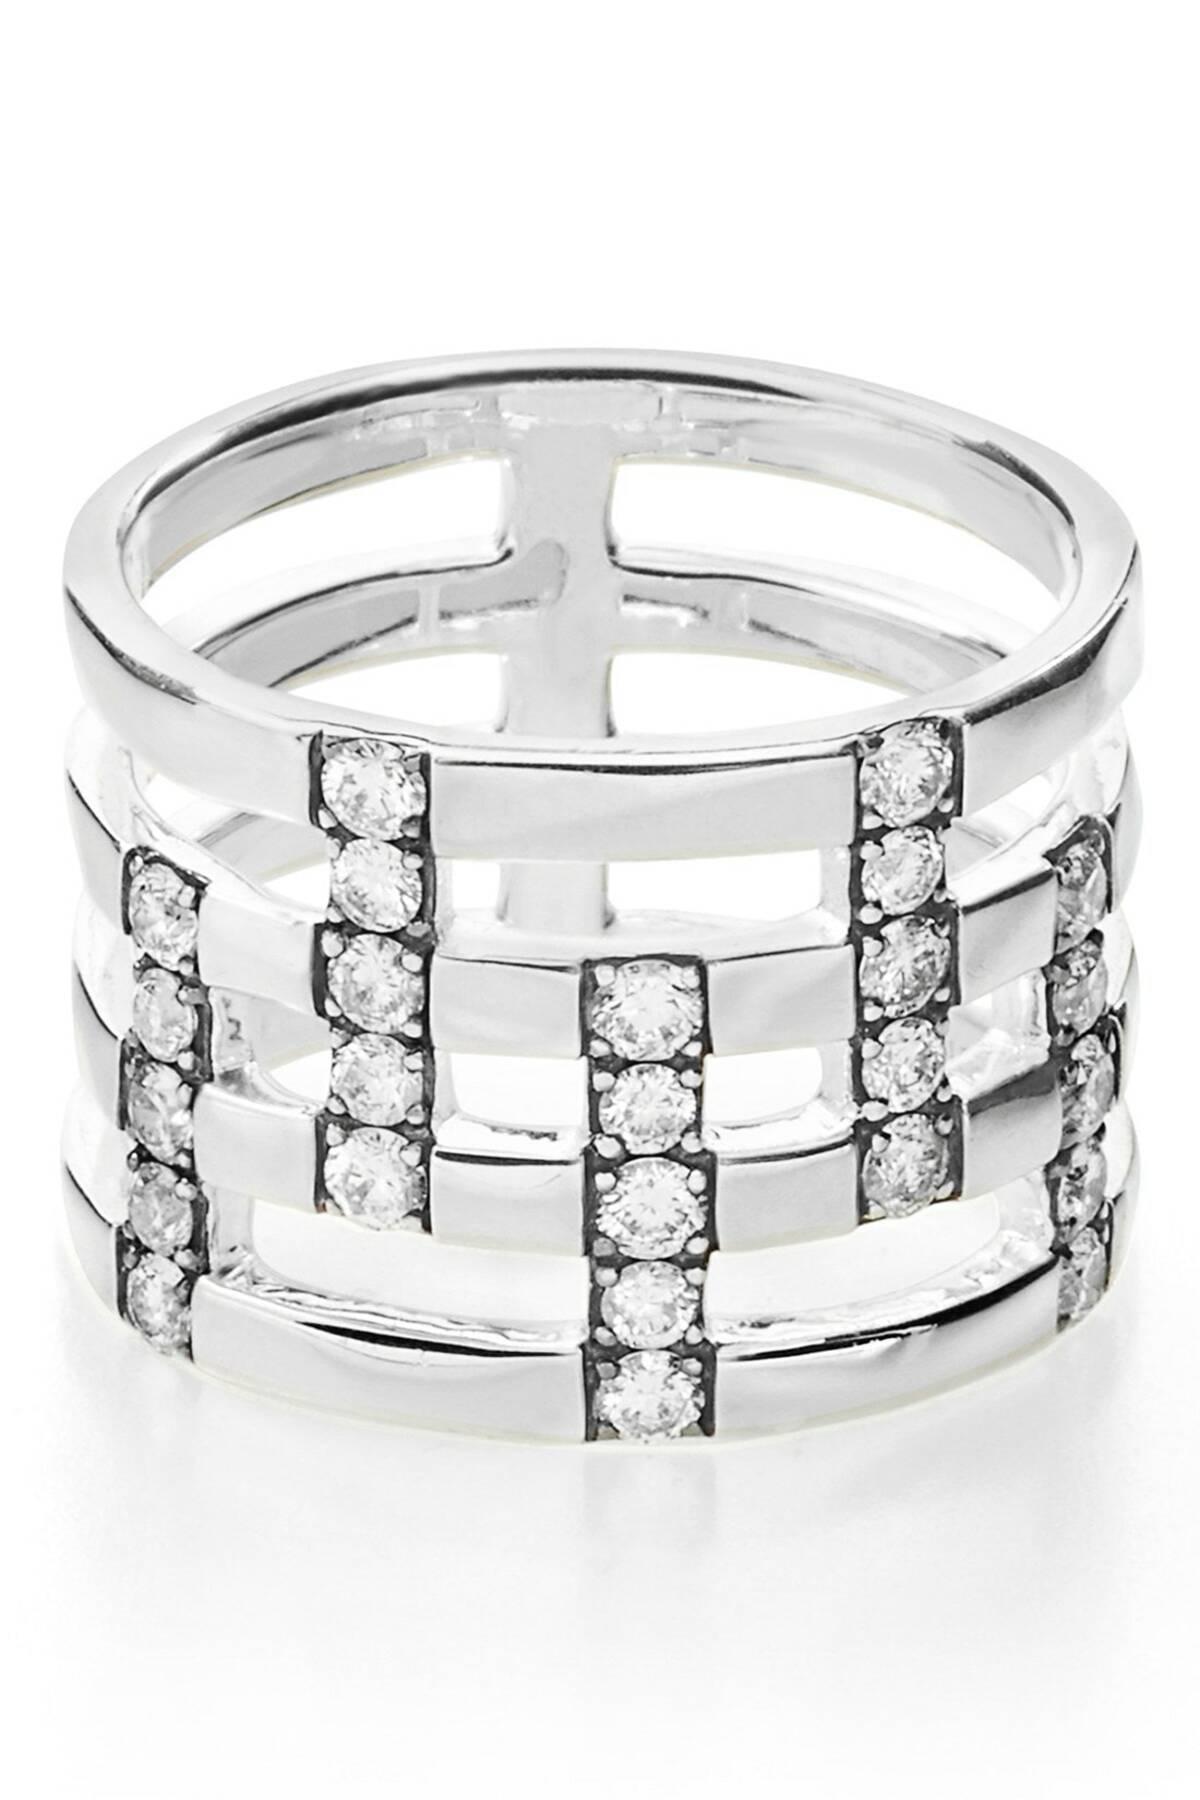 ded0c4356 Ippolita Glamazon Stardust Pave Diamond Openwork Ring - 0.72 Ctw in ...